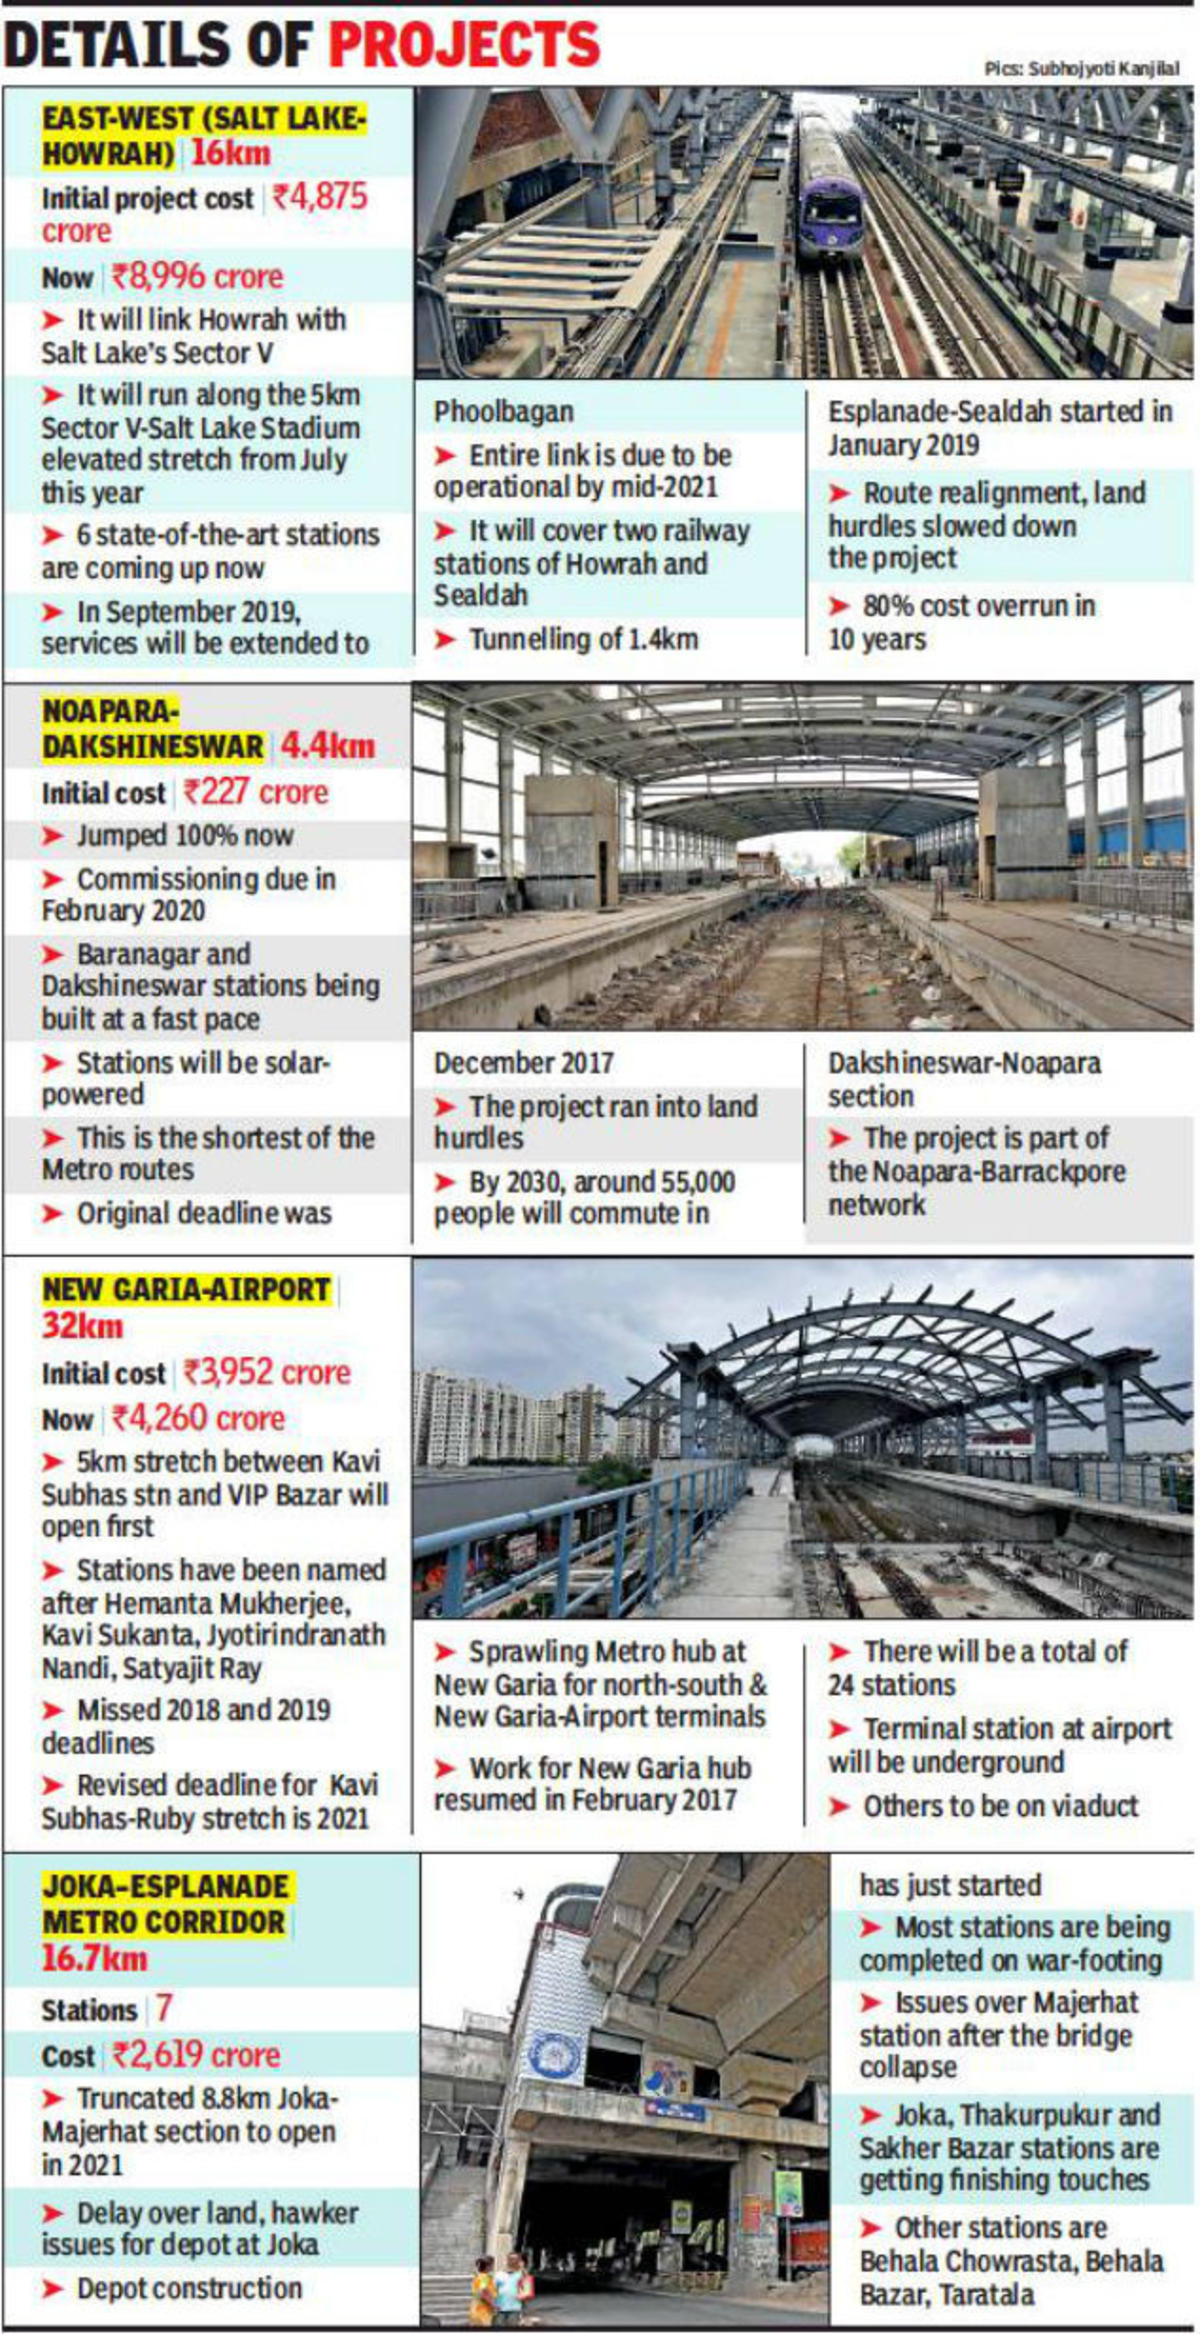 Kolkata: Work on fast track as East-West Metro eyes new